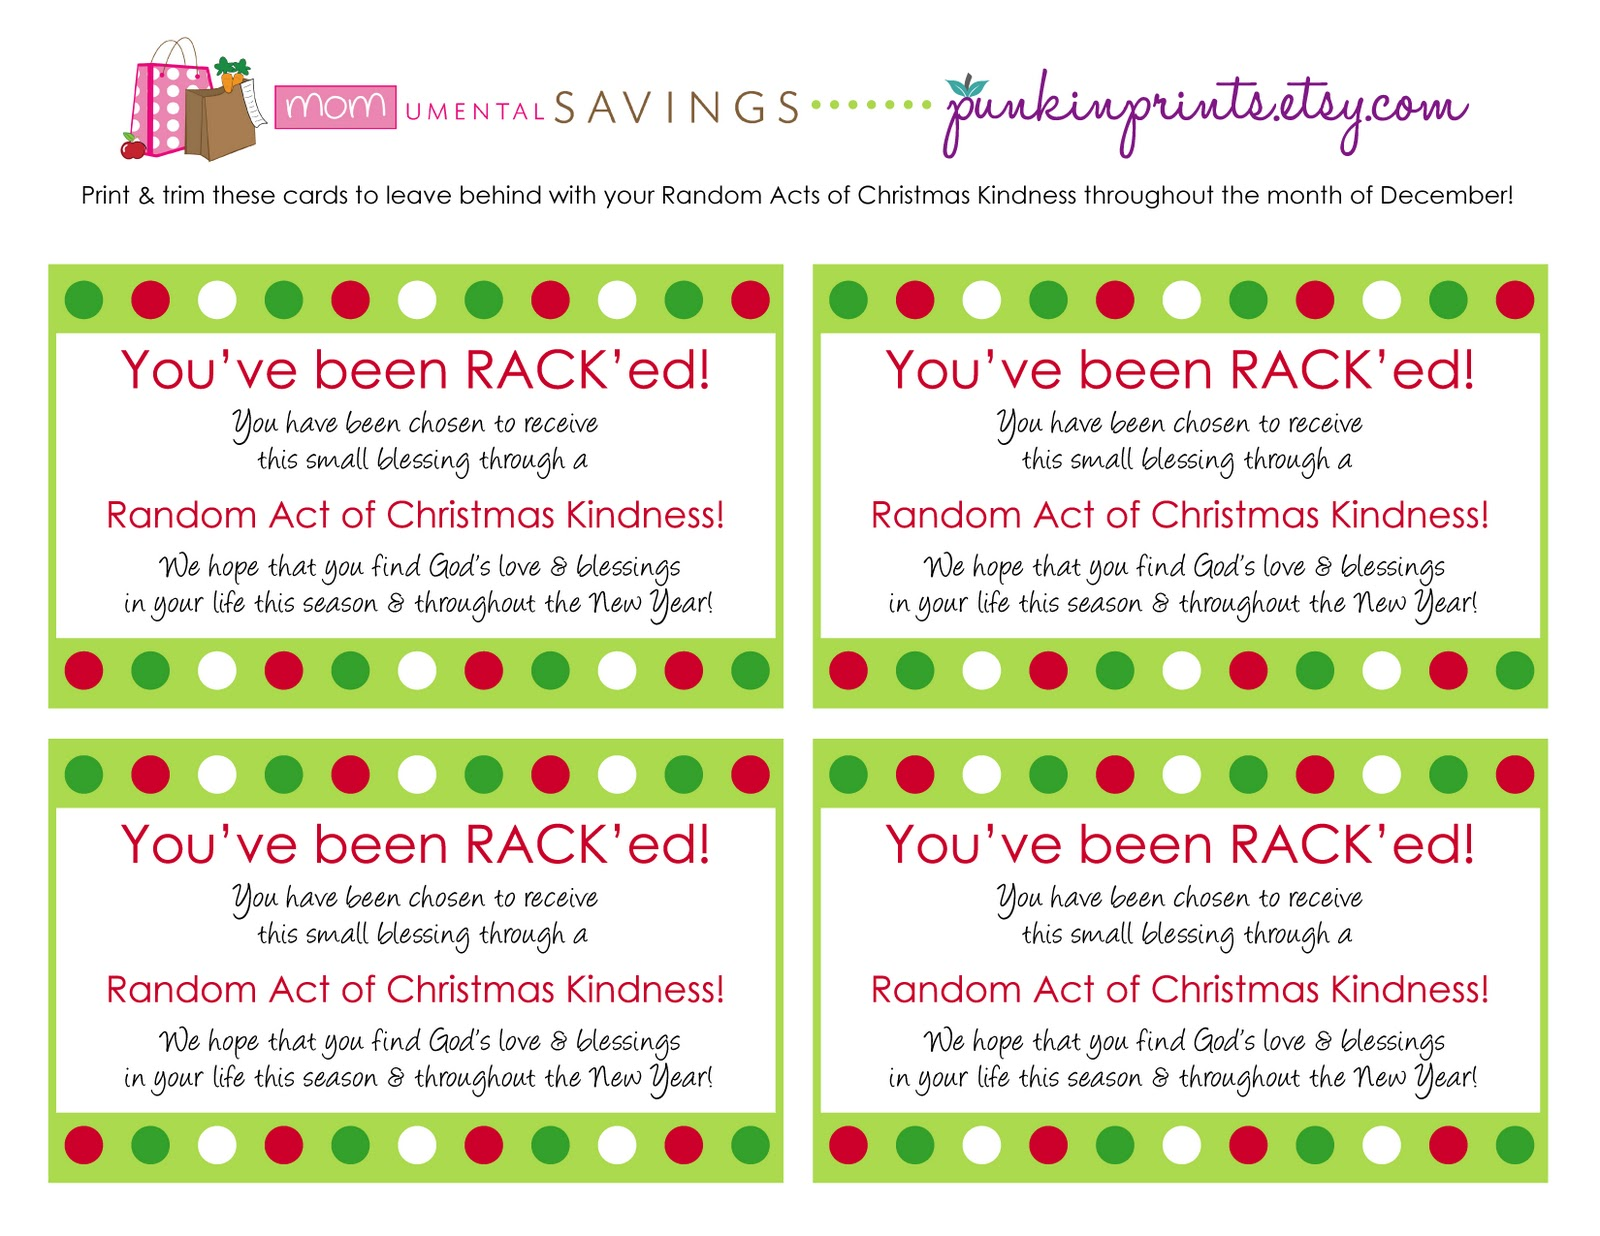 MOMumental Savings: Random Acts of Christmas Kindness